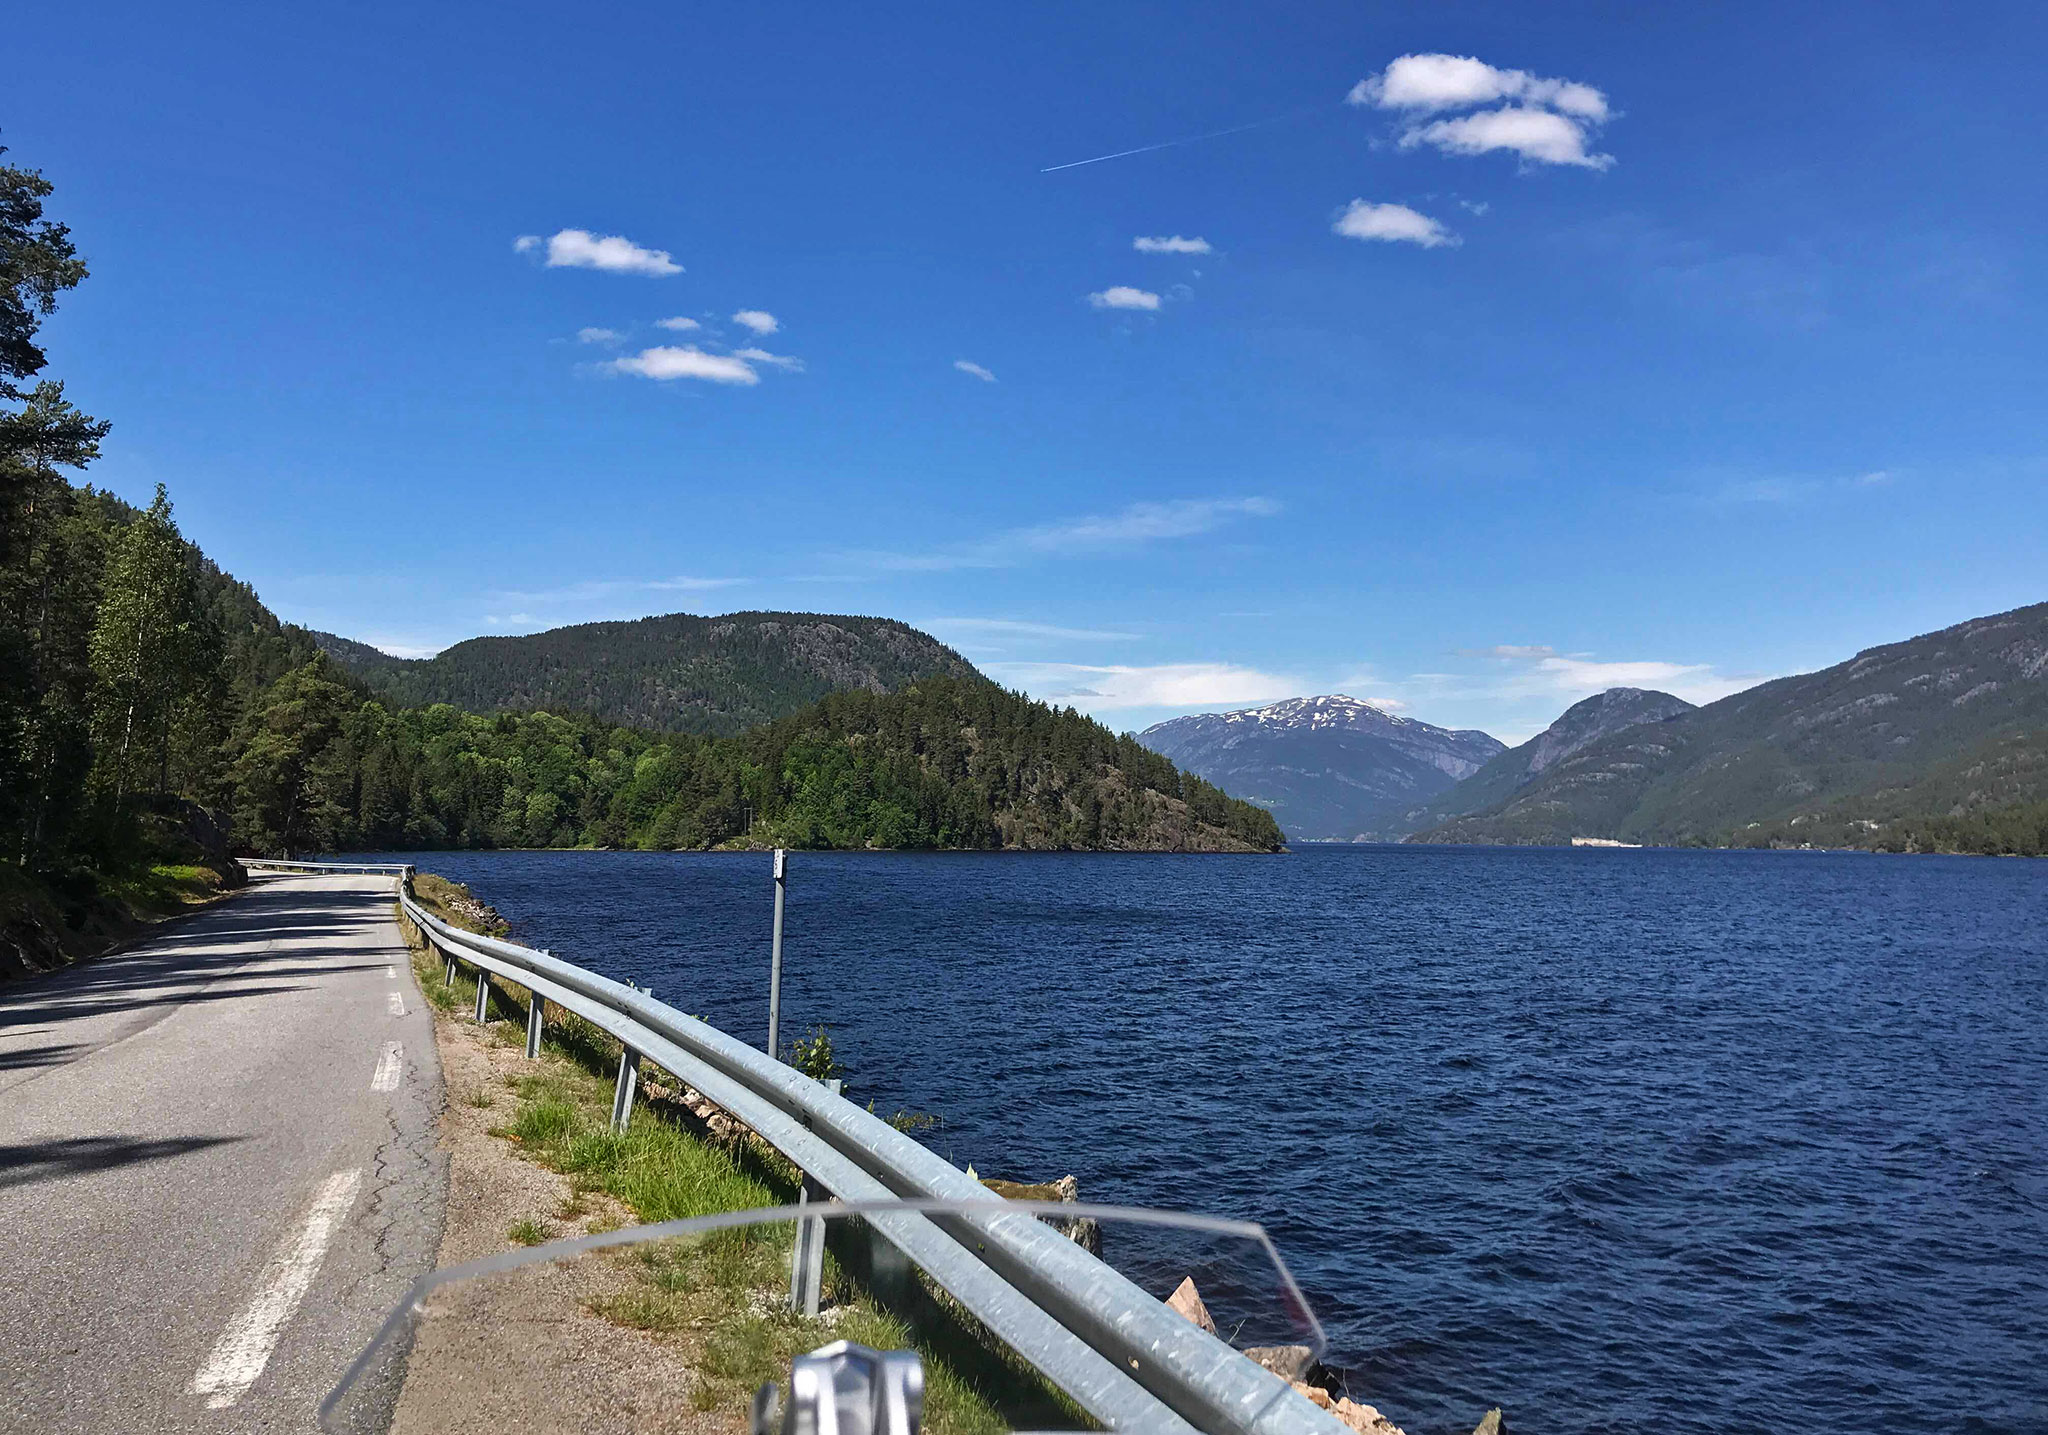 Before fate intervened: along Seljordsvatn (Seljord lake)